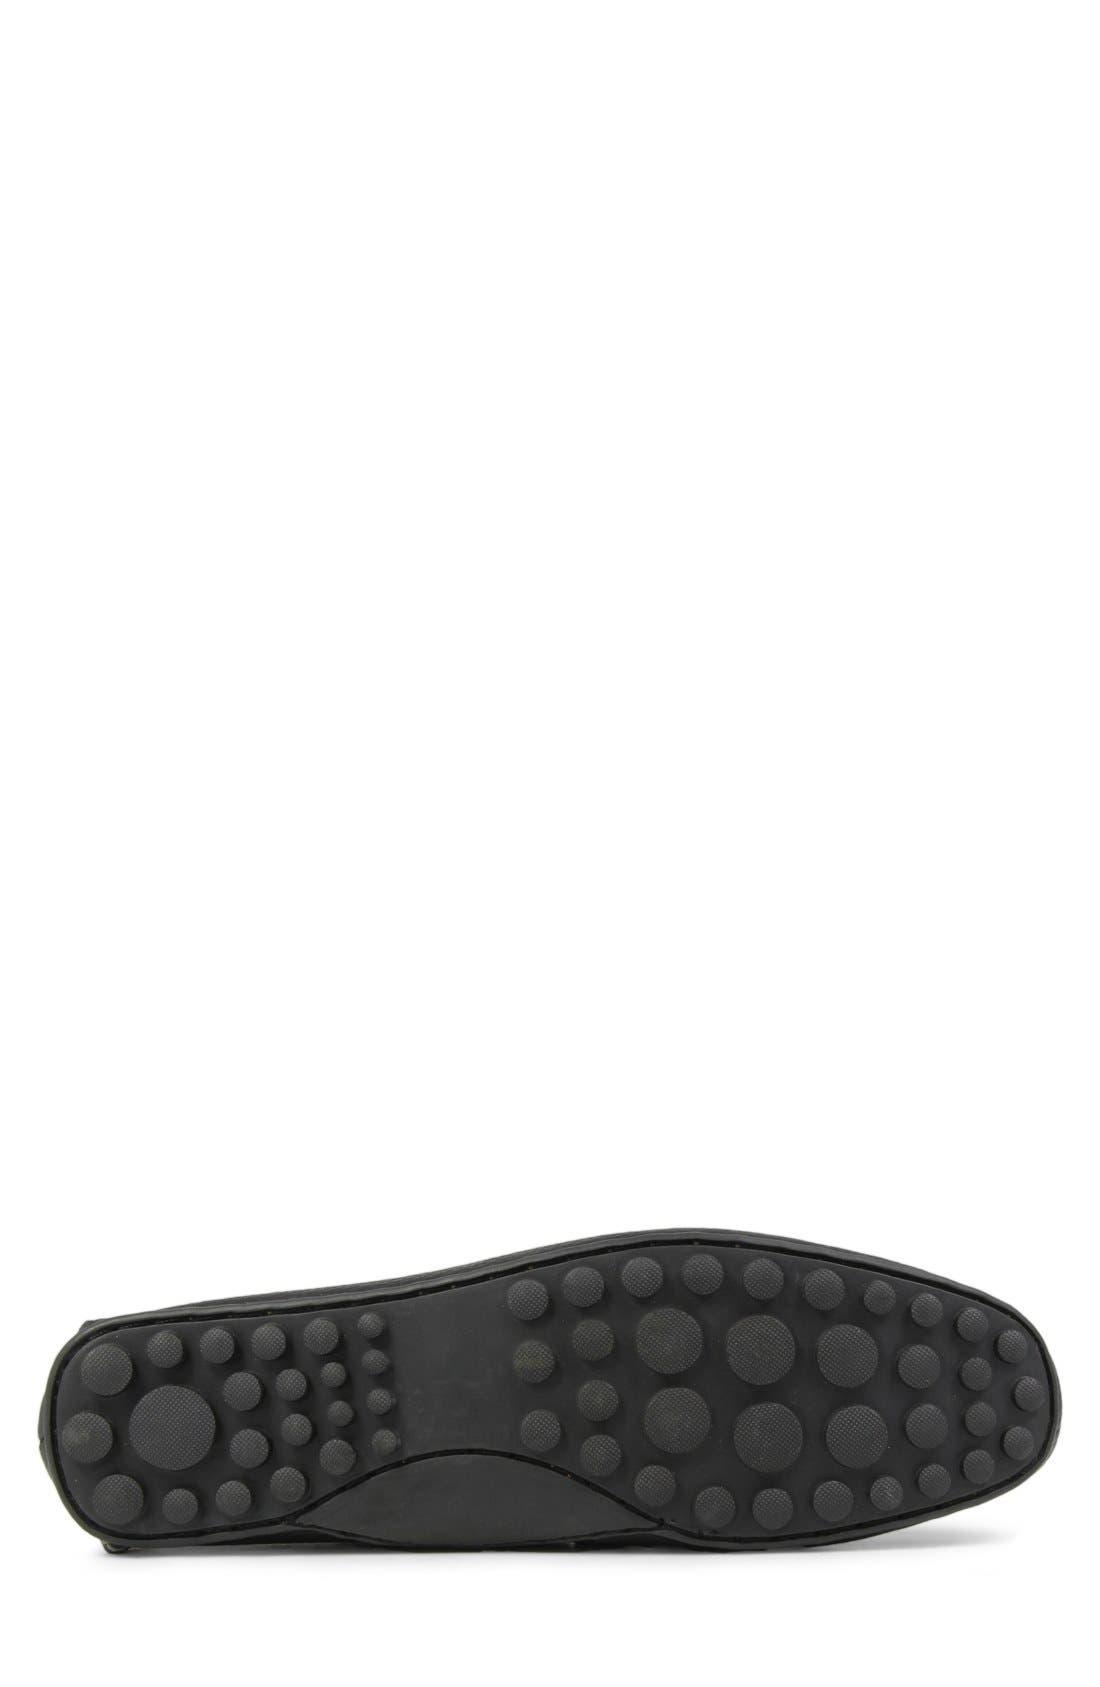 'Danforth' Driving Shoe,                             Alternate thumbnail 4, color,                             BLACK LEATHER